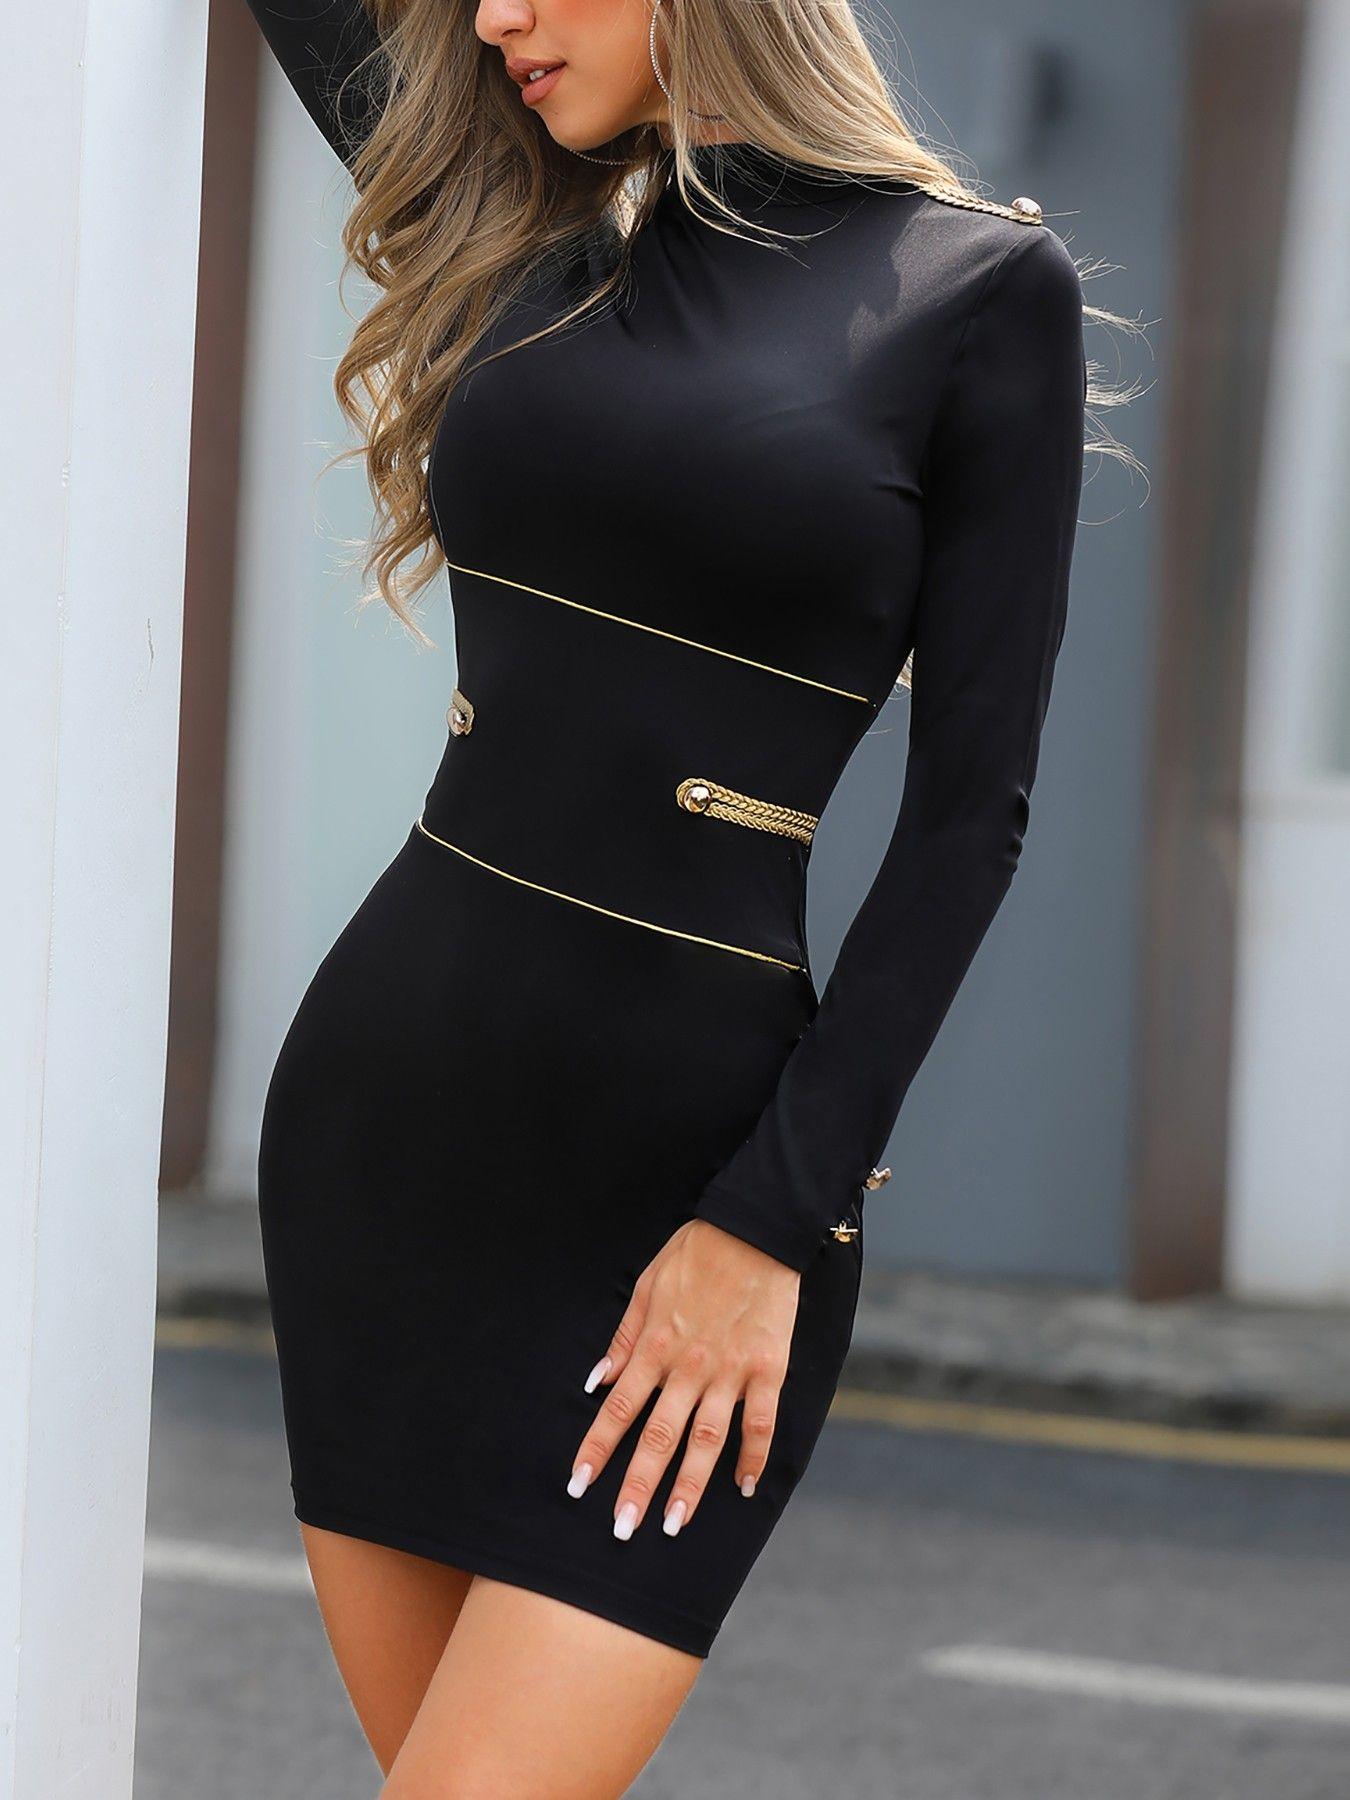 f8a4762d Button Design Long Sleeve Bodycon Dress (S/M/L/XL) $31.99 | Hair in ...